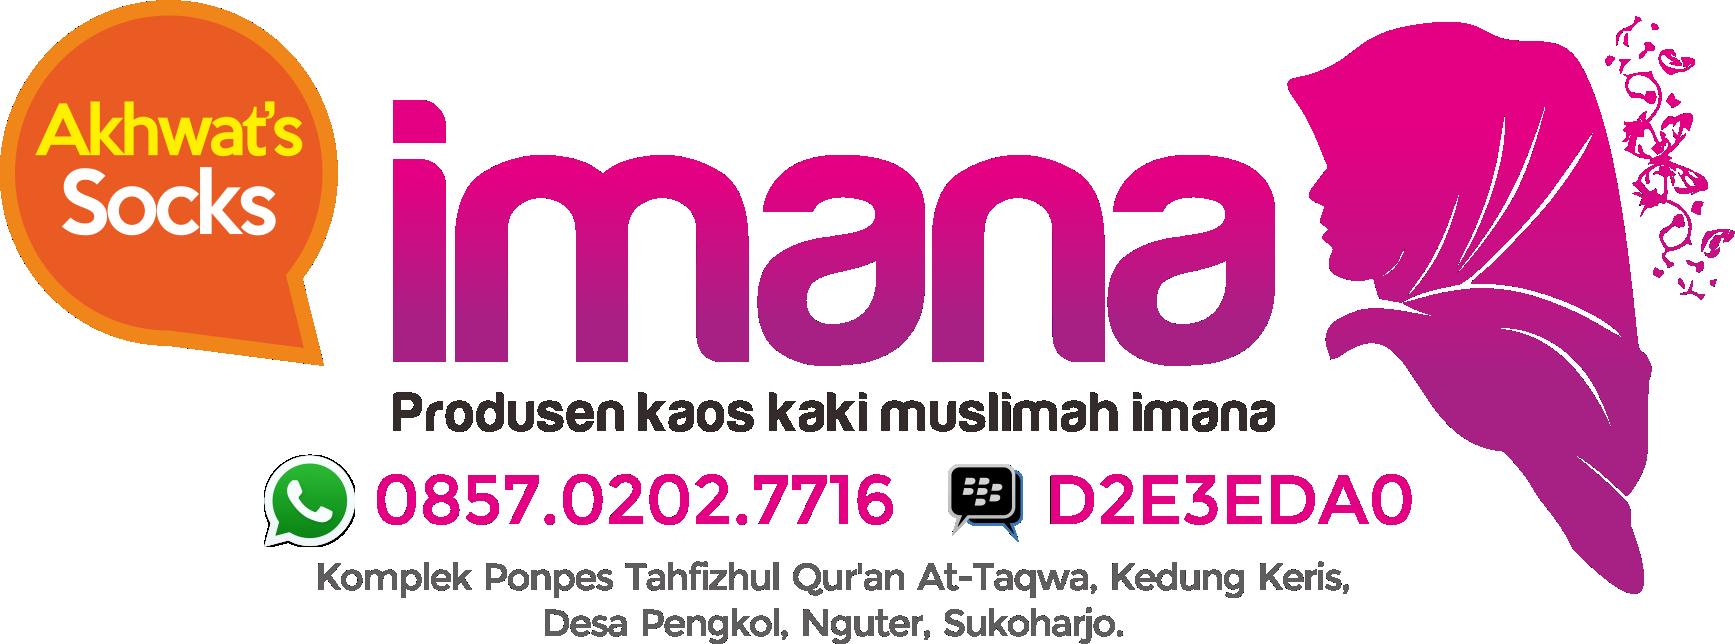 Podusen Kaos Kaki Muslimah Imana